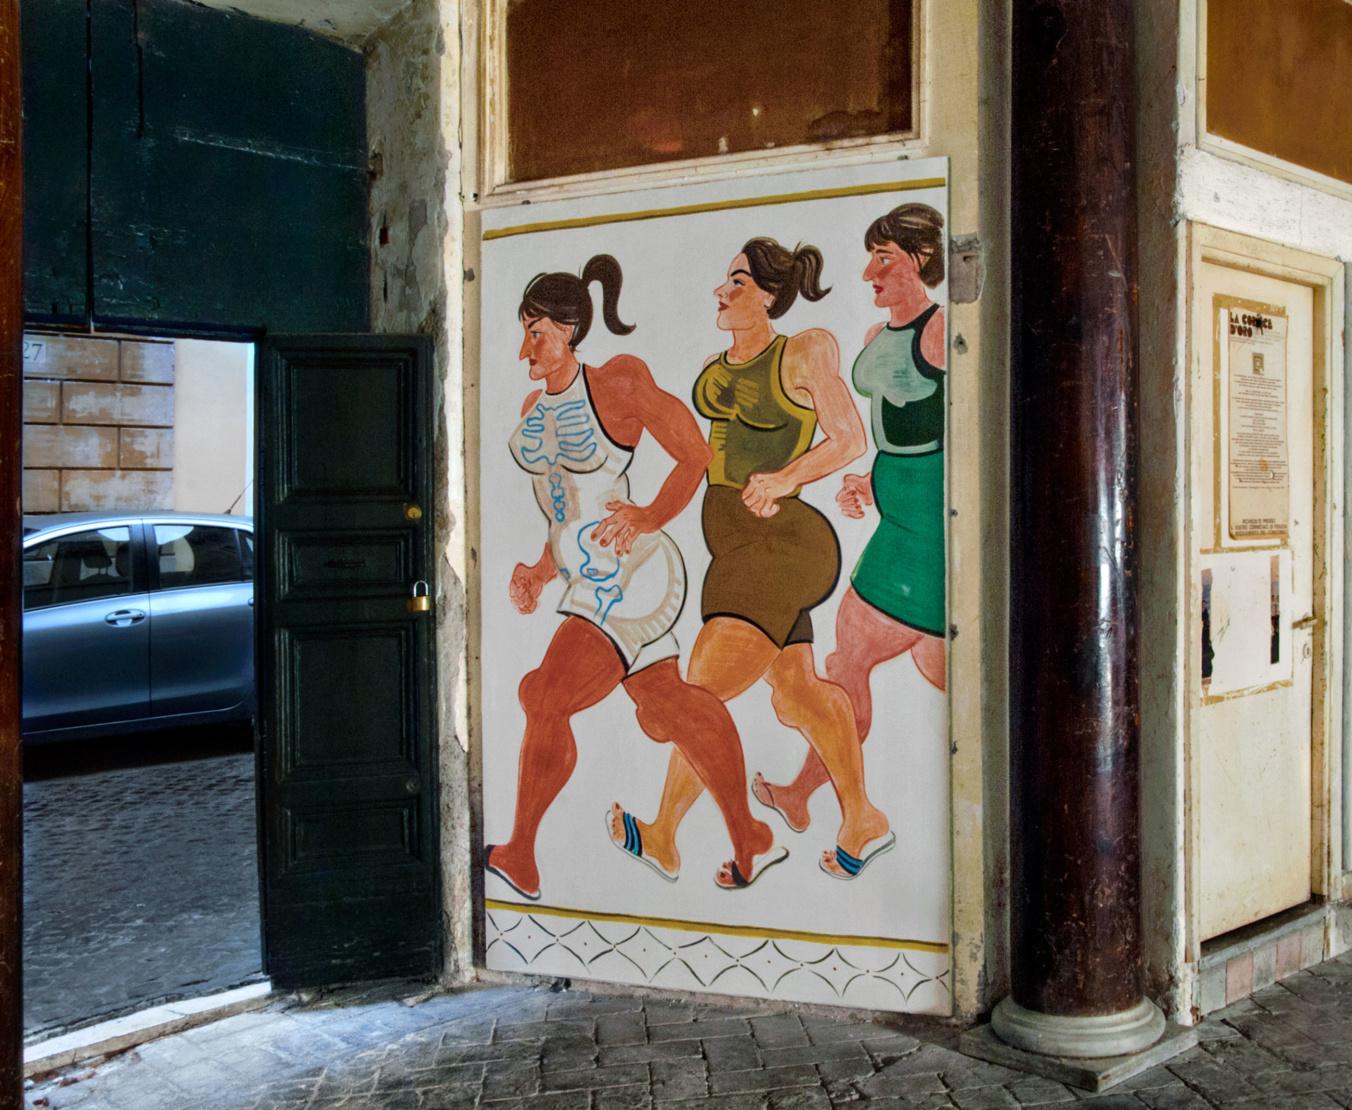 EXIT IN FLIP FLOPS , 2016. INSTALLATION VIEW OF VANITAS AT SANT'ANDREA DE SCAPHIS, ROME DEC 14 – JAN 28, 2016. COURTESY OF THE ARTIST AND GAVIN BROWN'S ENTERPRISE, NEW YORK/ROME ©ELLA KRUGLYANSKAYA, 2018.